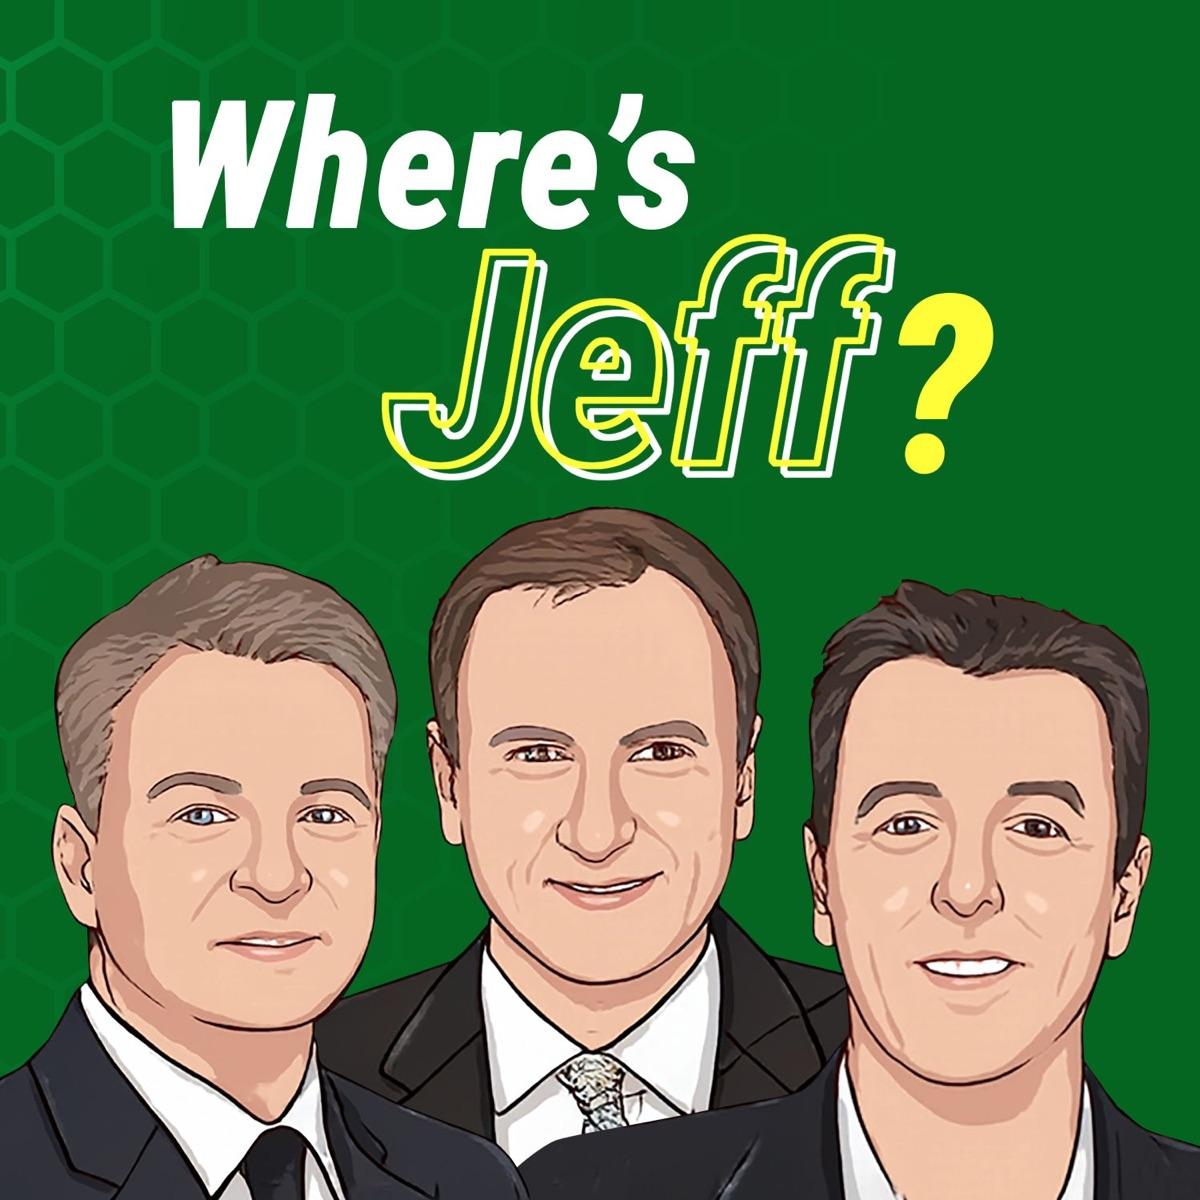 Where's Jeff?